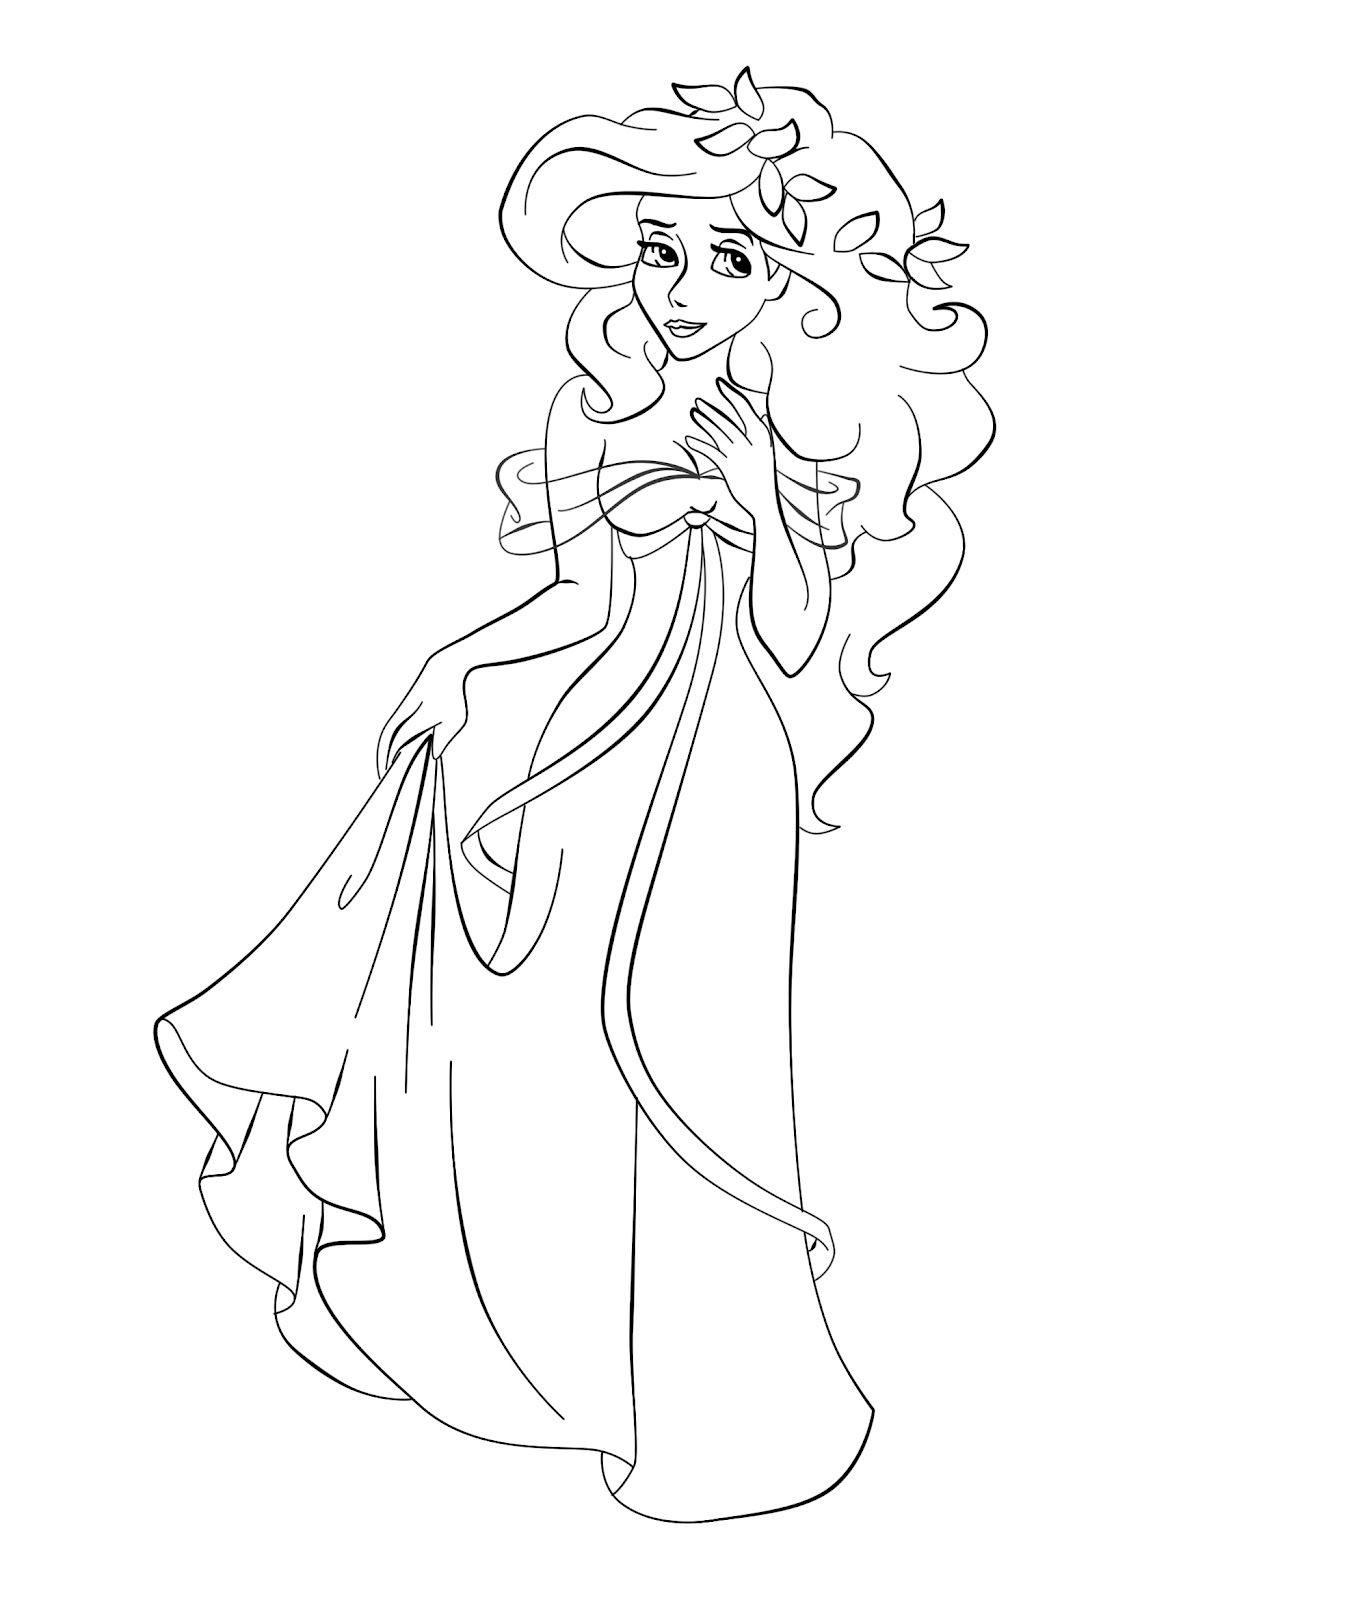 Coloring Sheet Coloring Book Disney Character Drawings Little Mermaid Drawings Disney Princess Cartoons